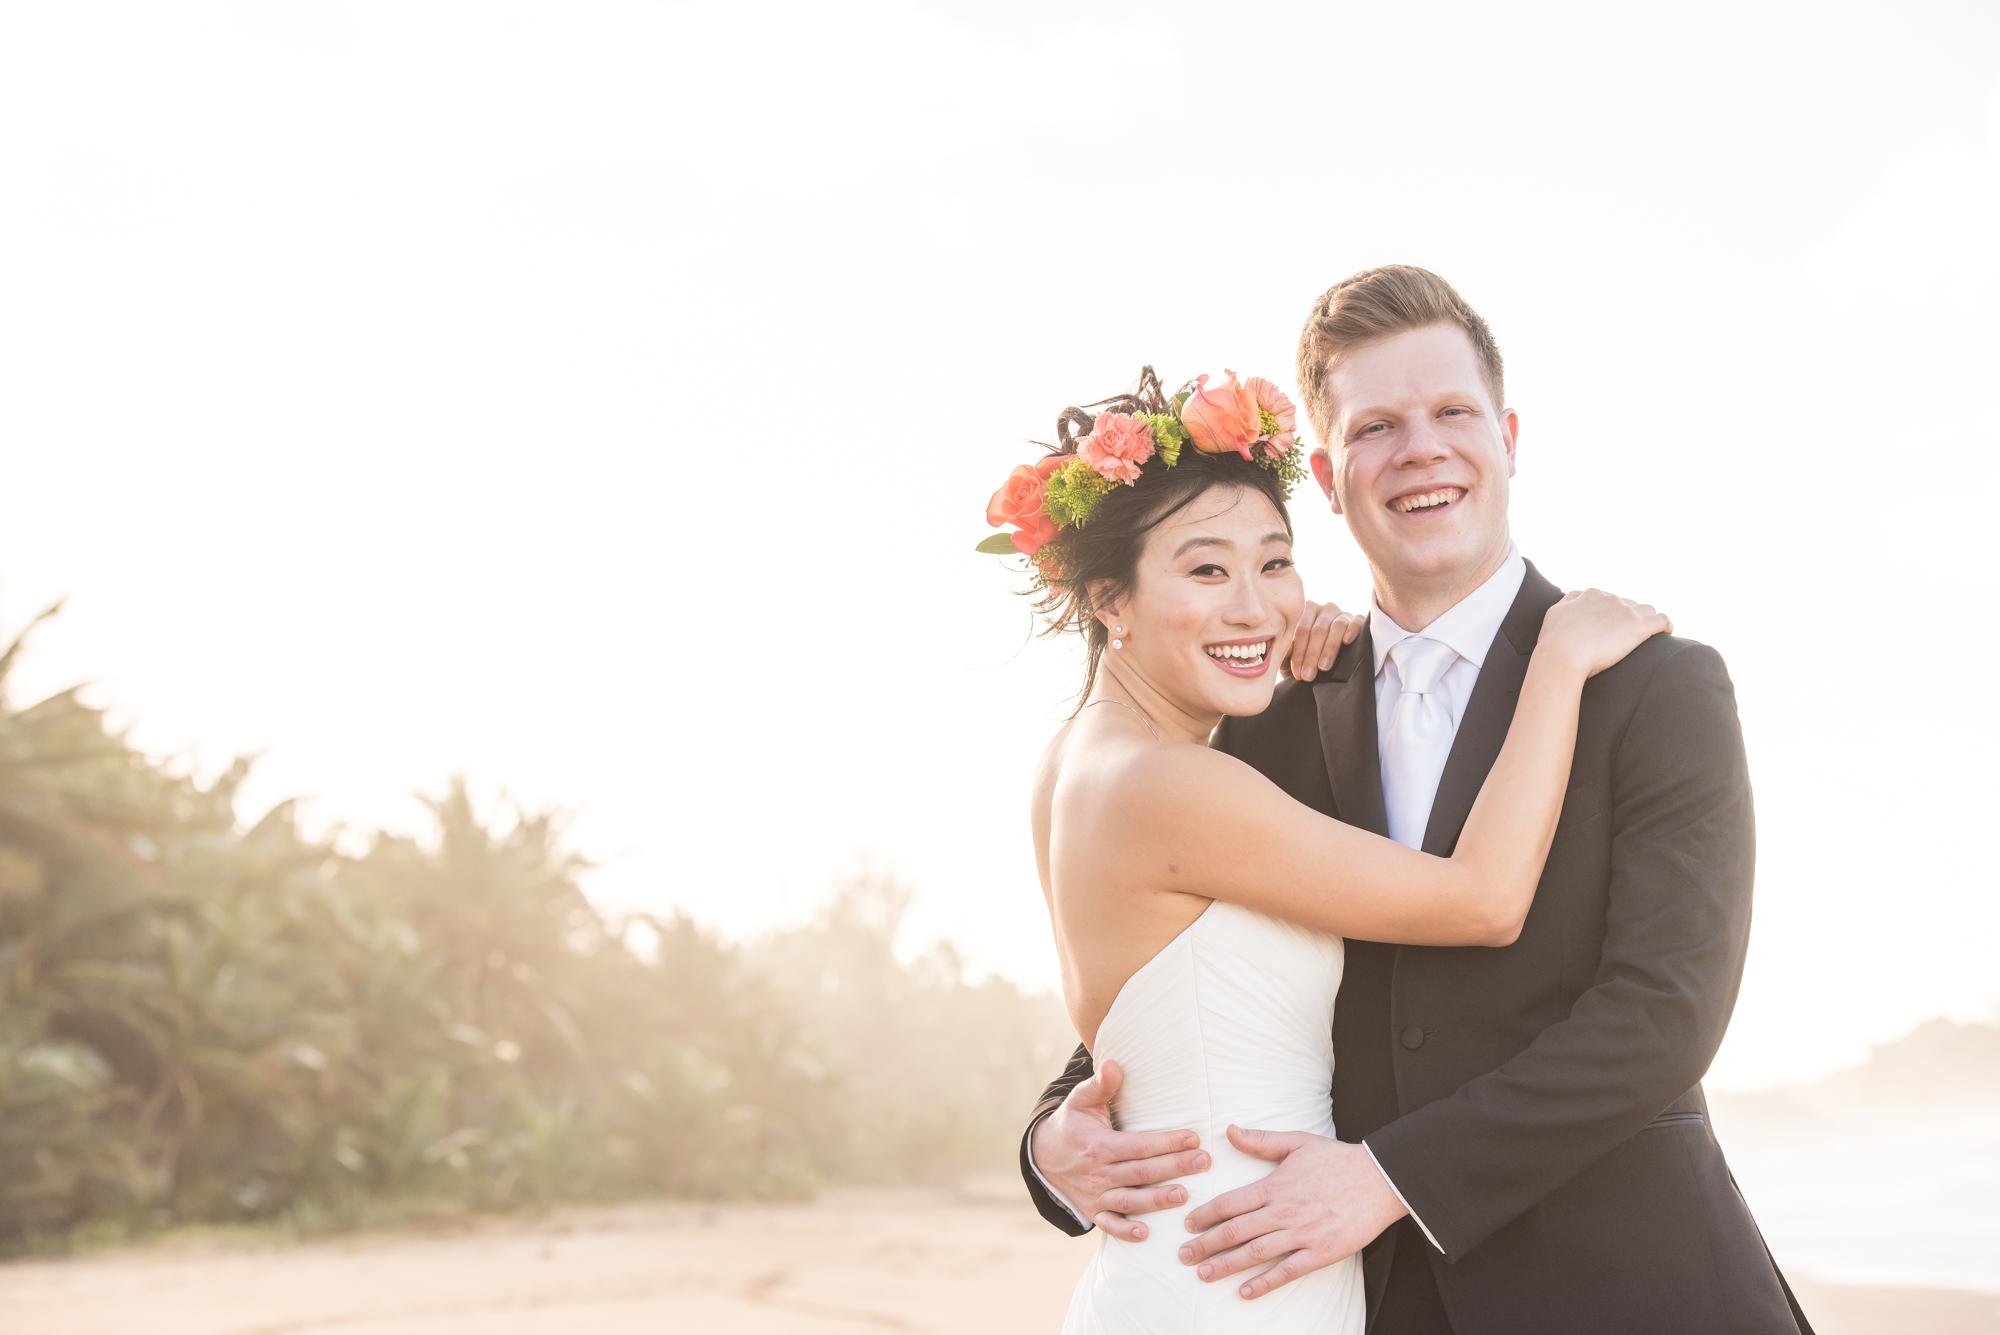 Yifan_Zhang_Geoff_Oberhofer_Carlin_Ma_wedding-1569.jpg